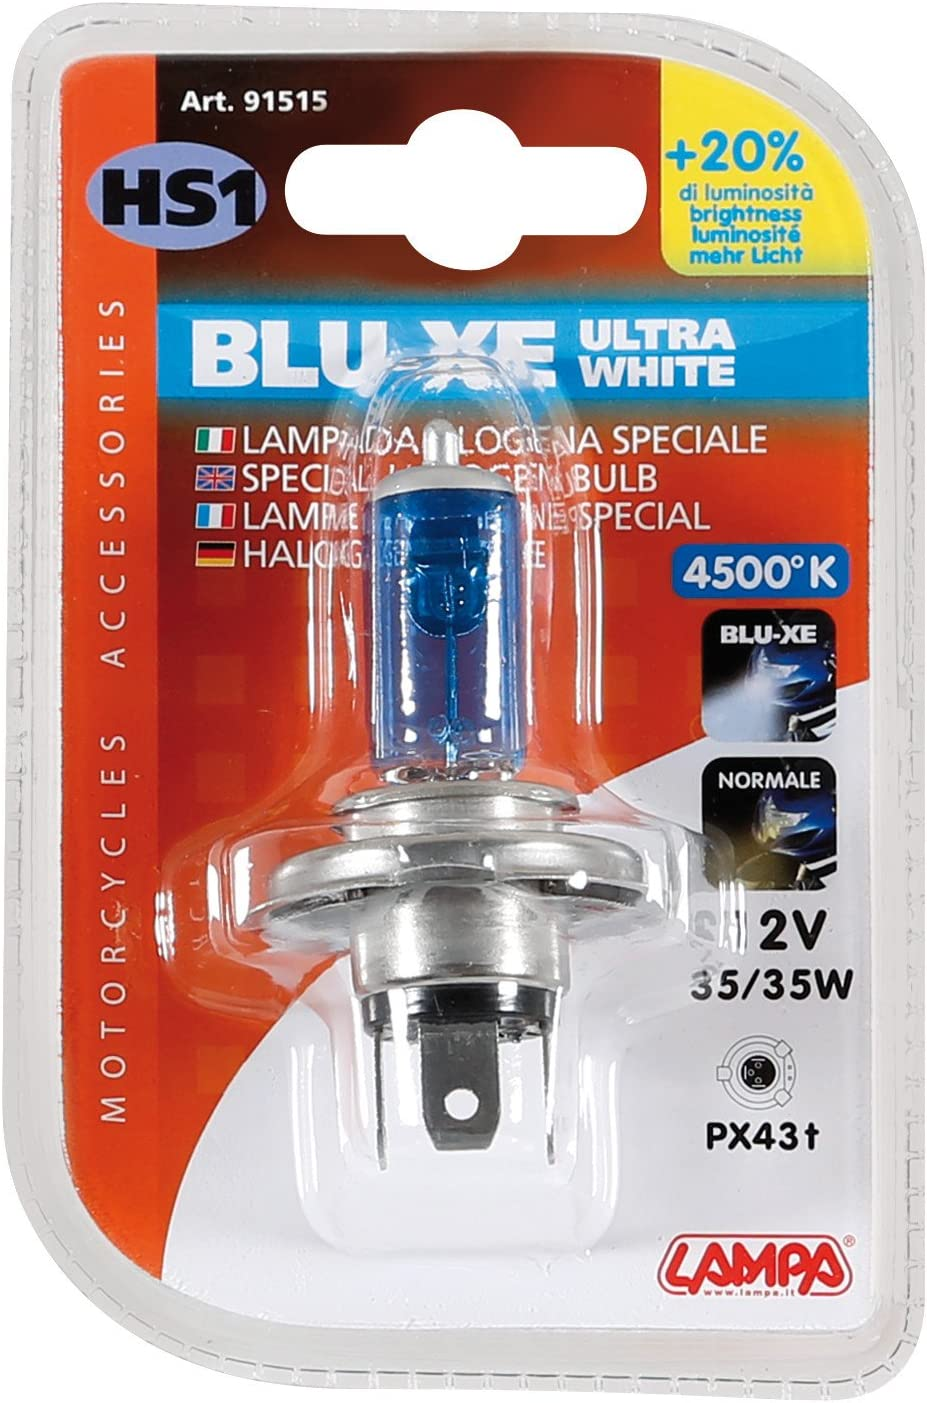 Lampa 91515 Blu-Xe Lampada